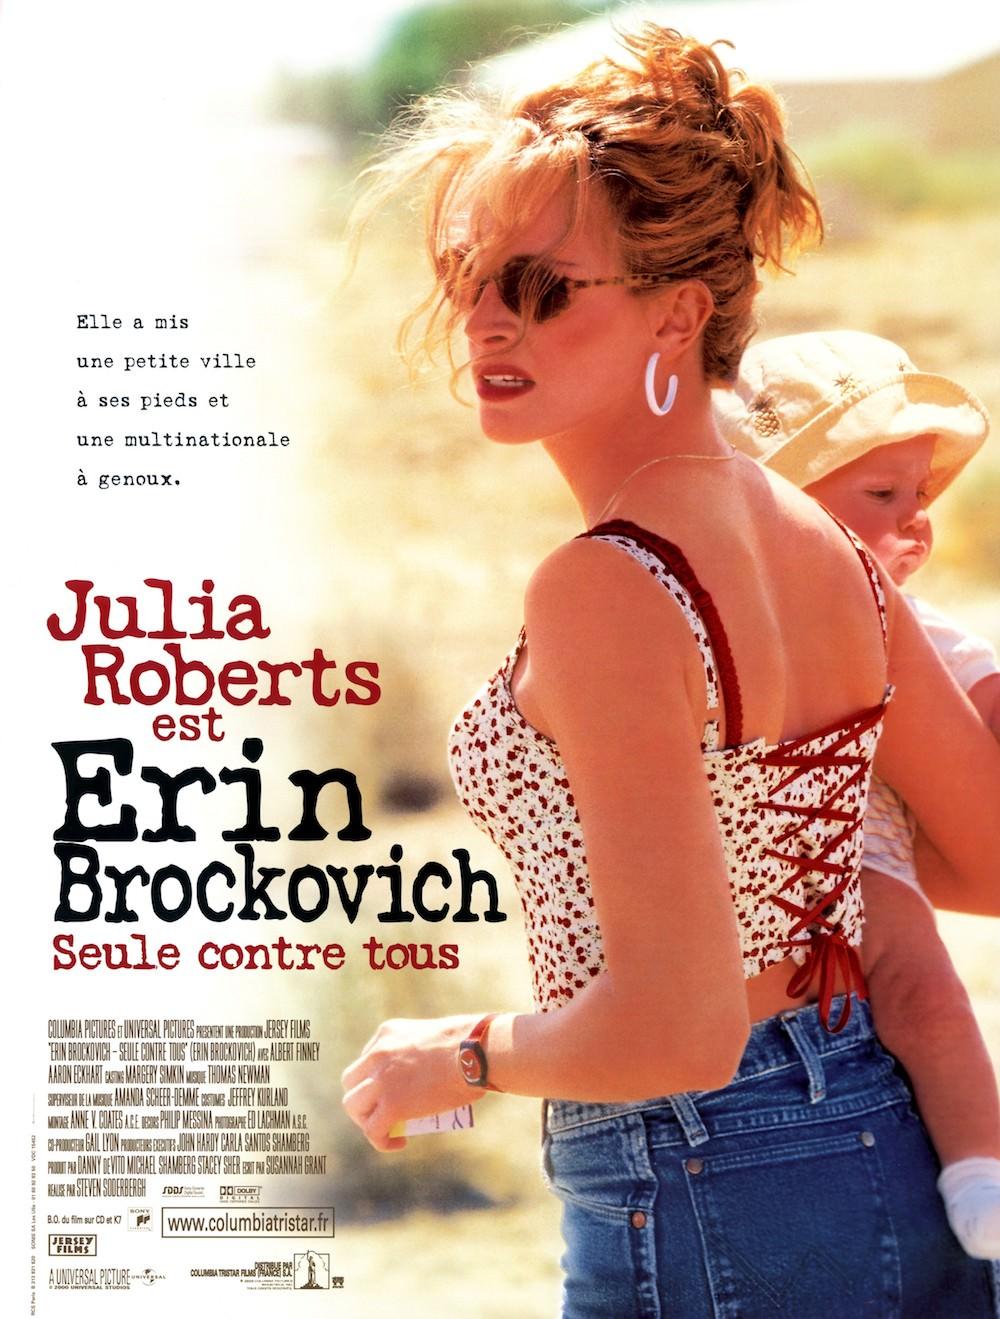 Erin brockovich soderbergh